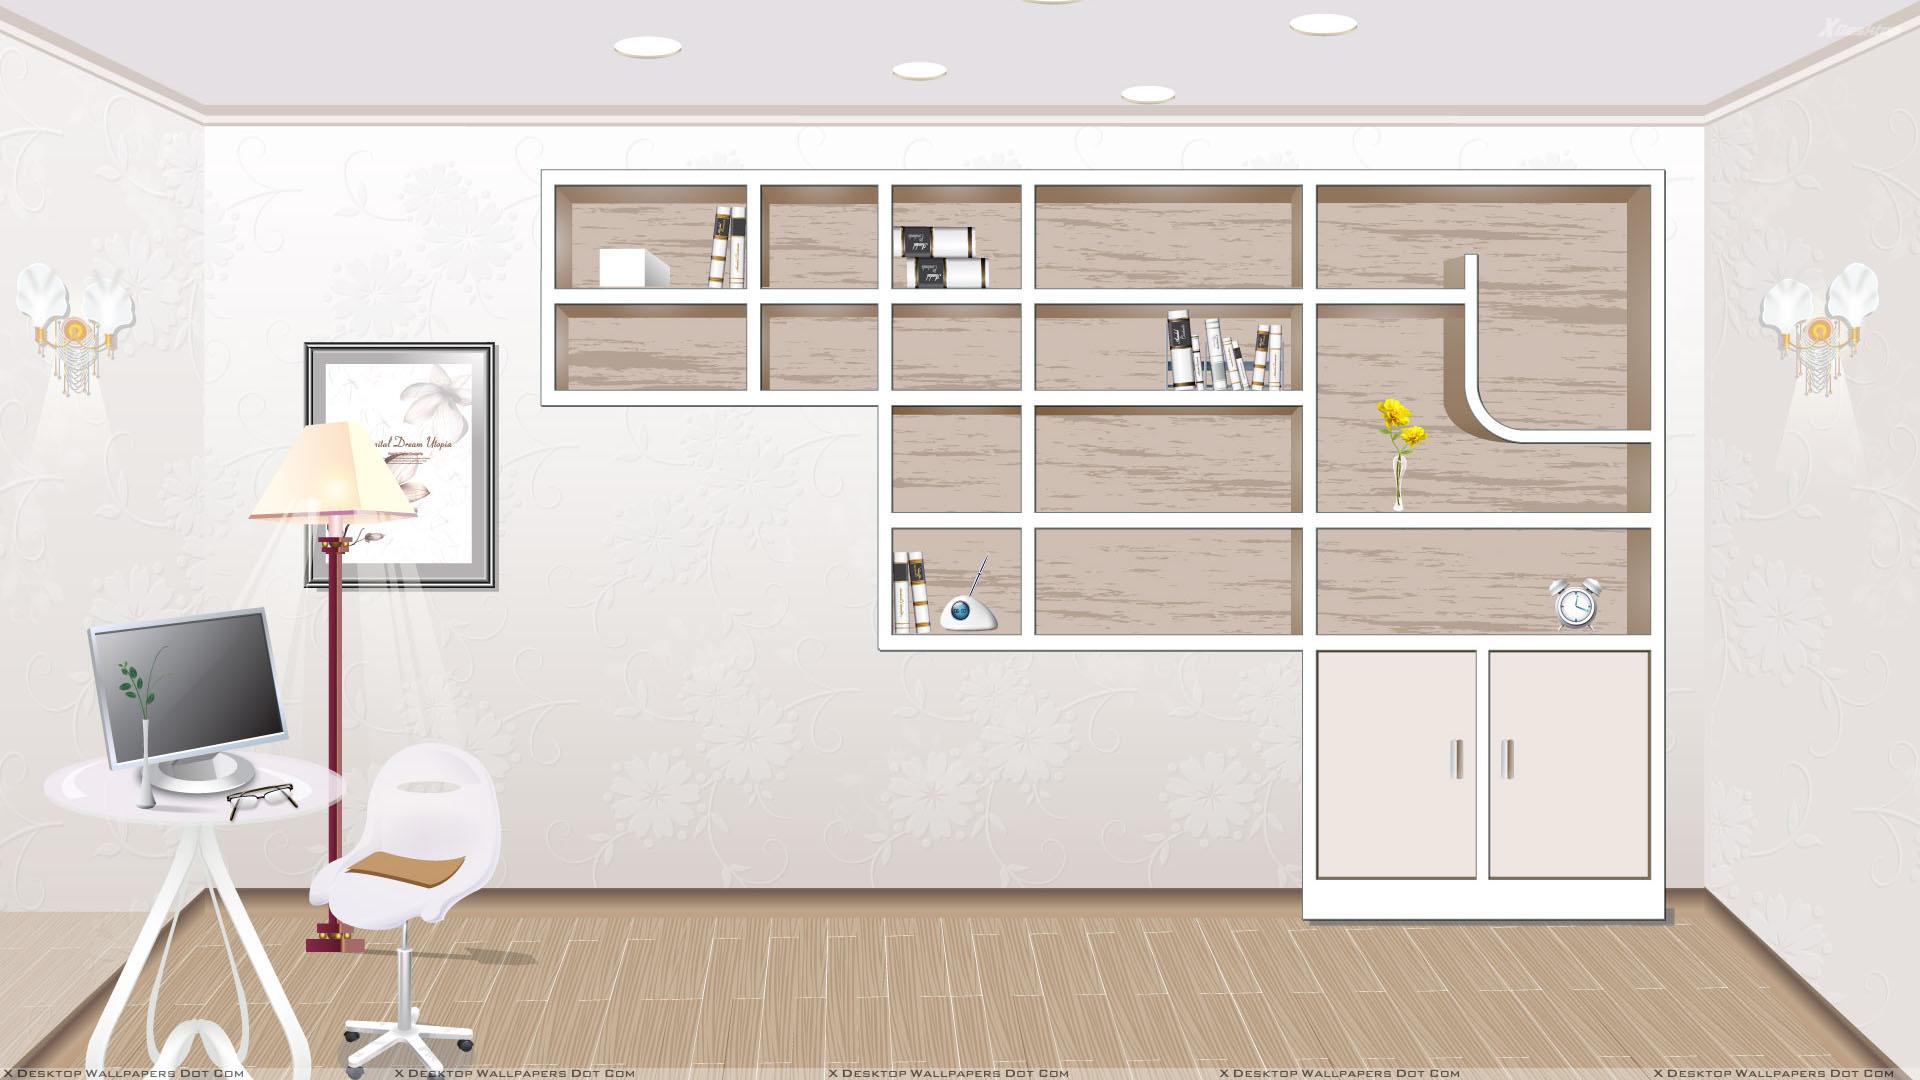 office desktop wallpaper,room,wall,interior design,furniture,floor